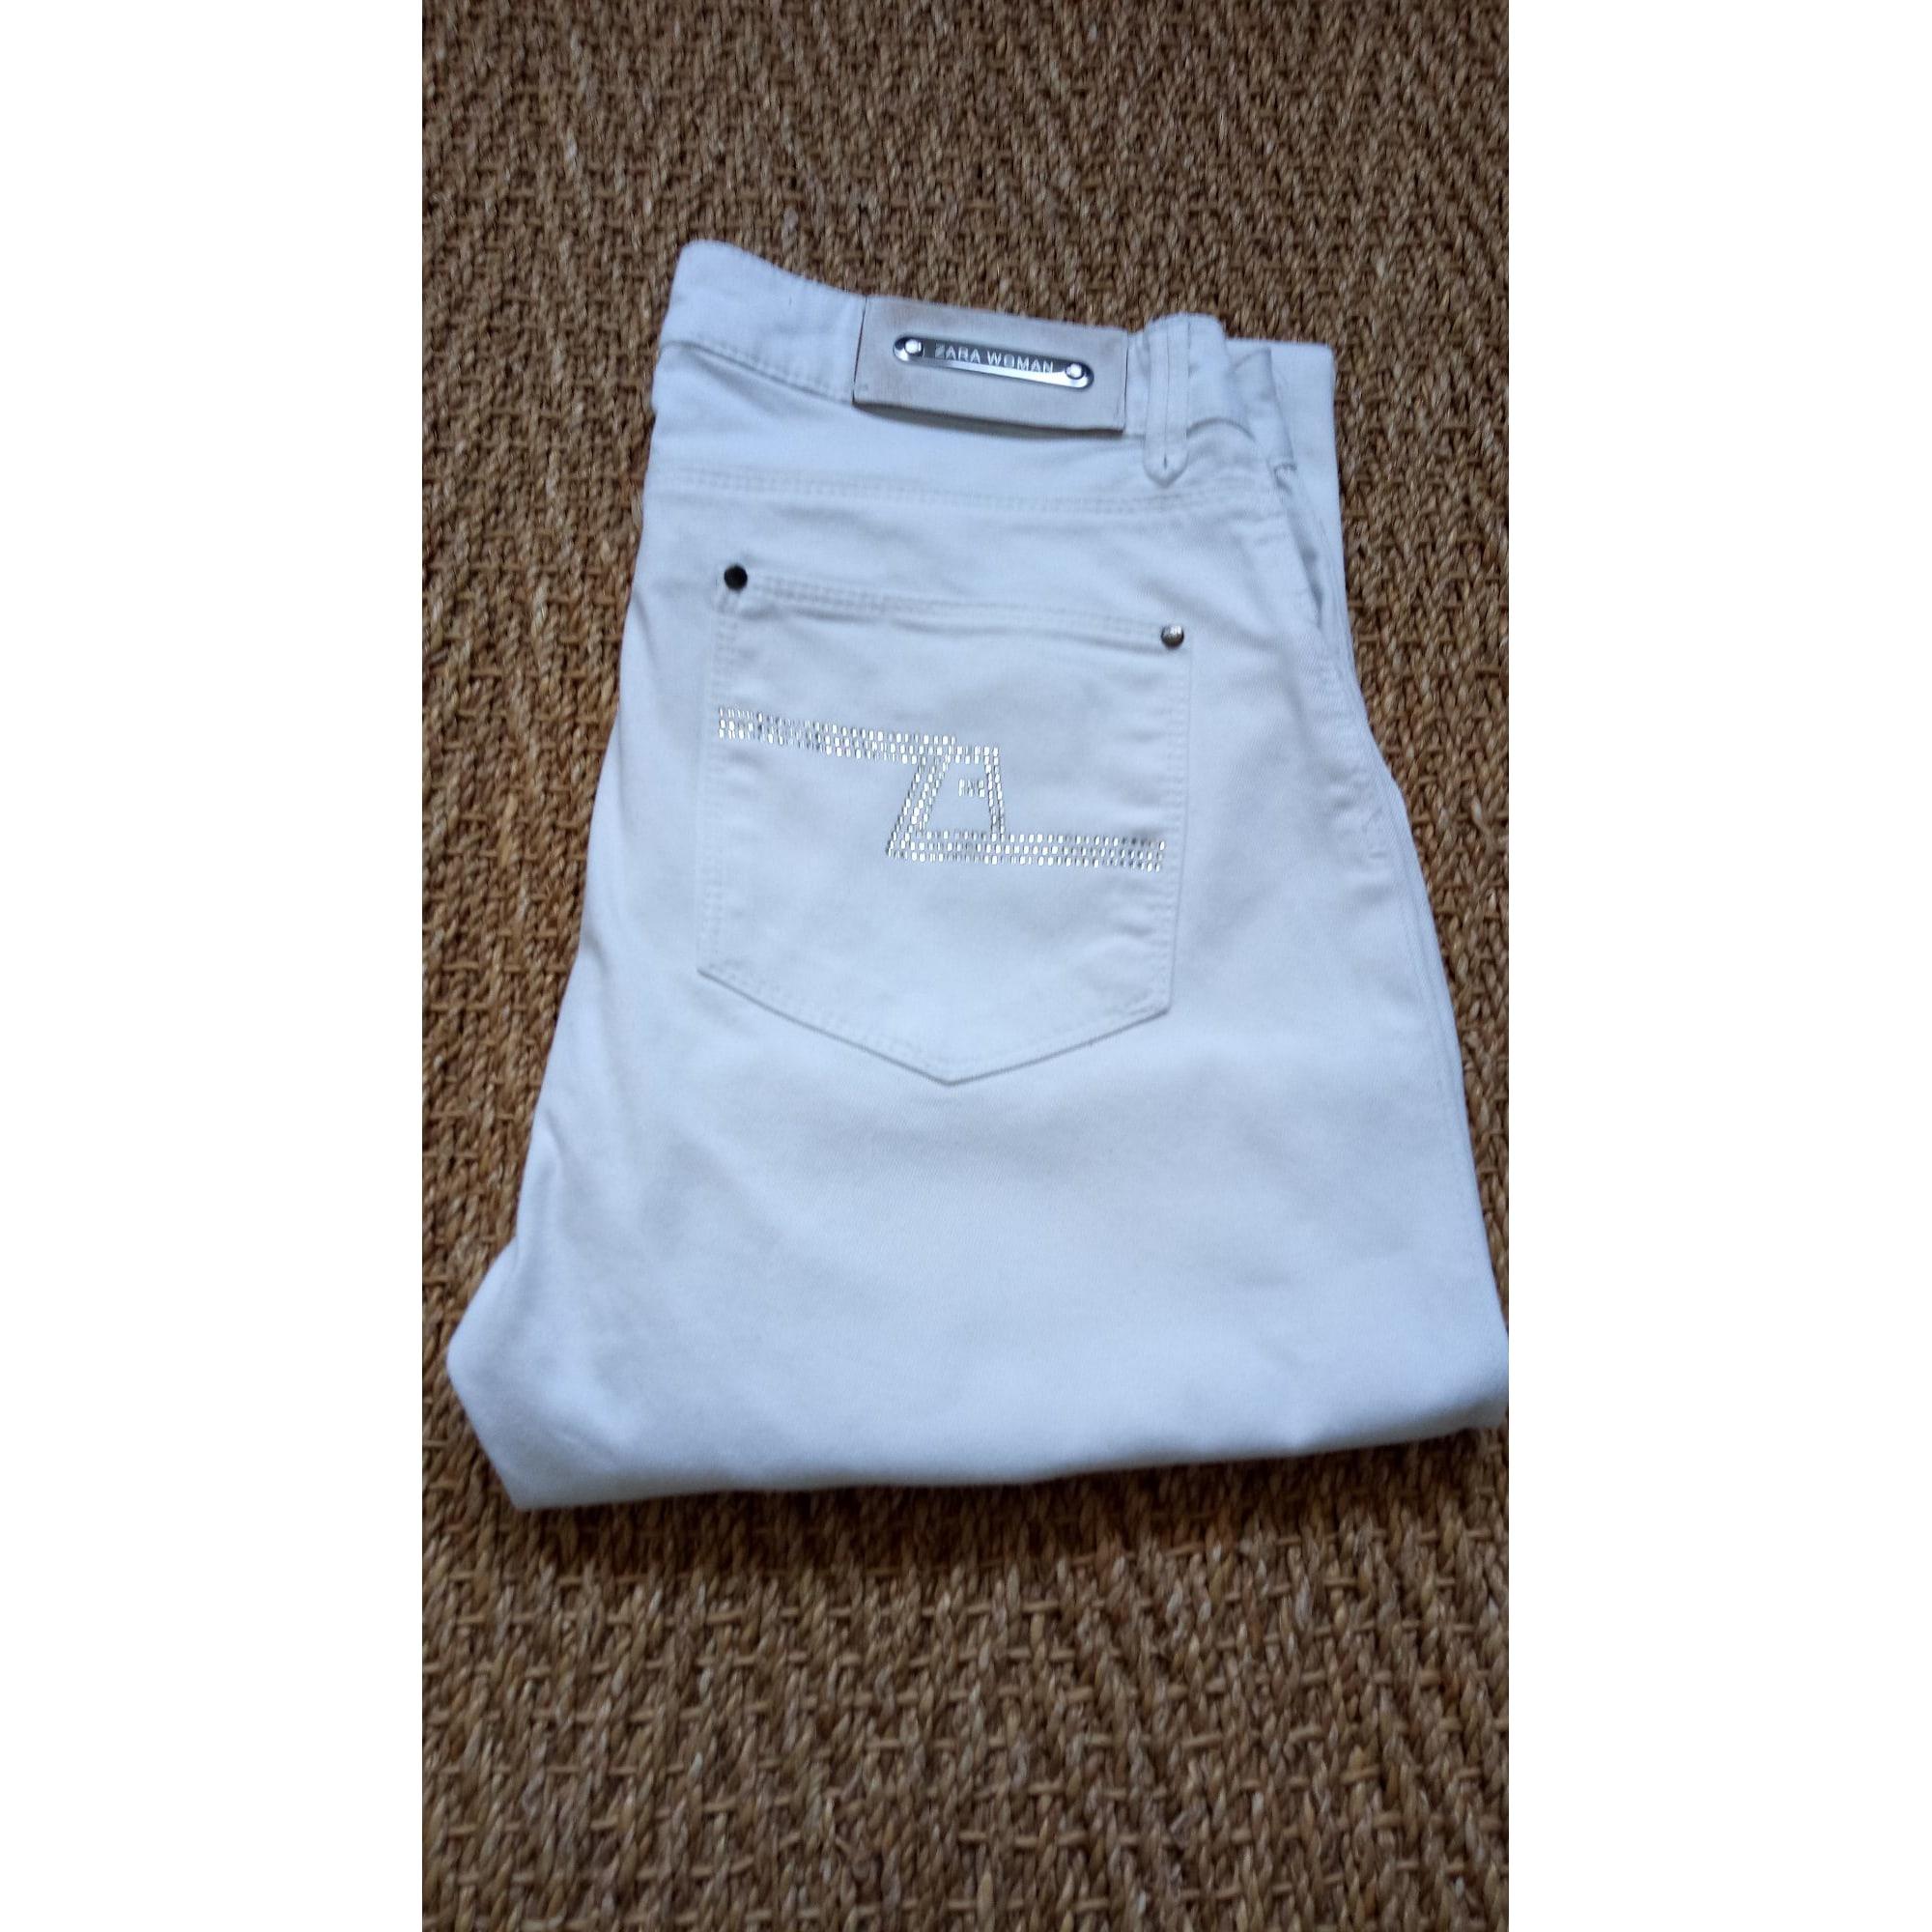 Jeans droit ZARA Blanc, blanc cassé, écru